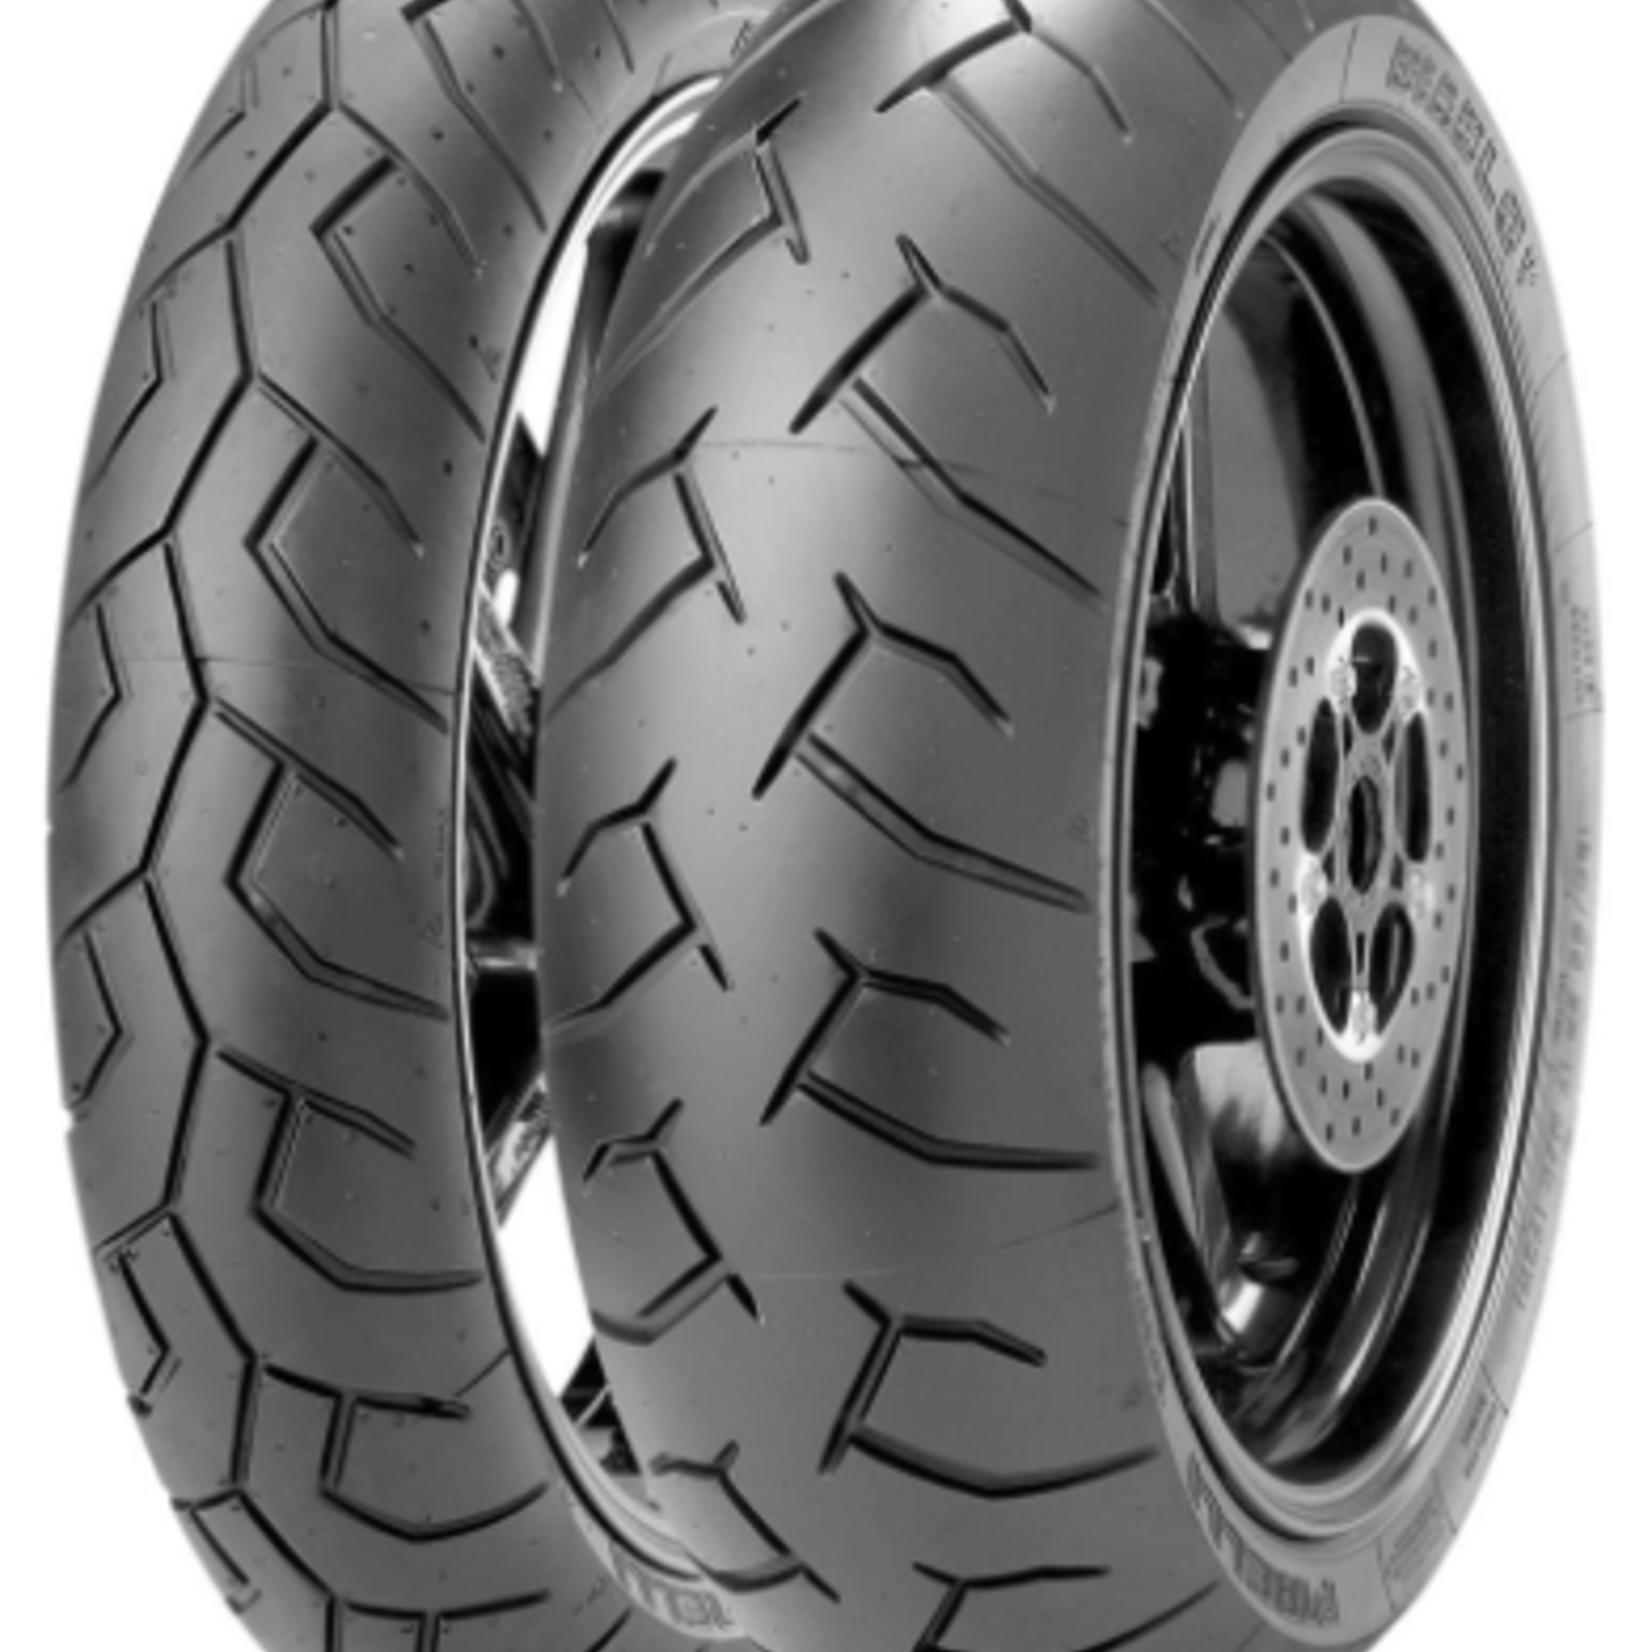 Pirelli Pirelli Street Diablo Supersport Front Tire - 120/70-17